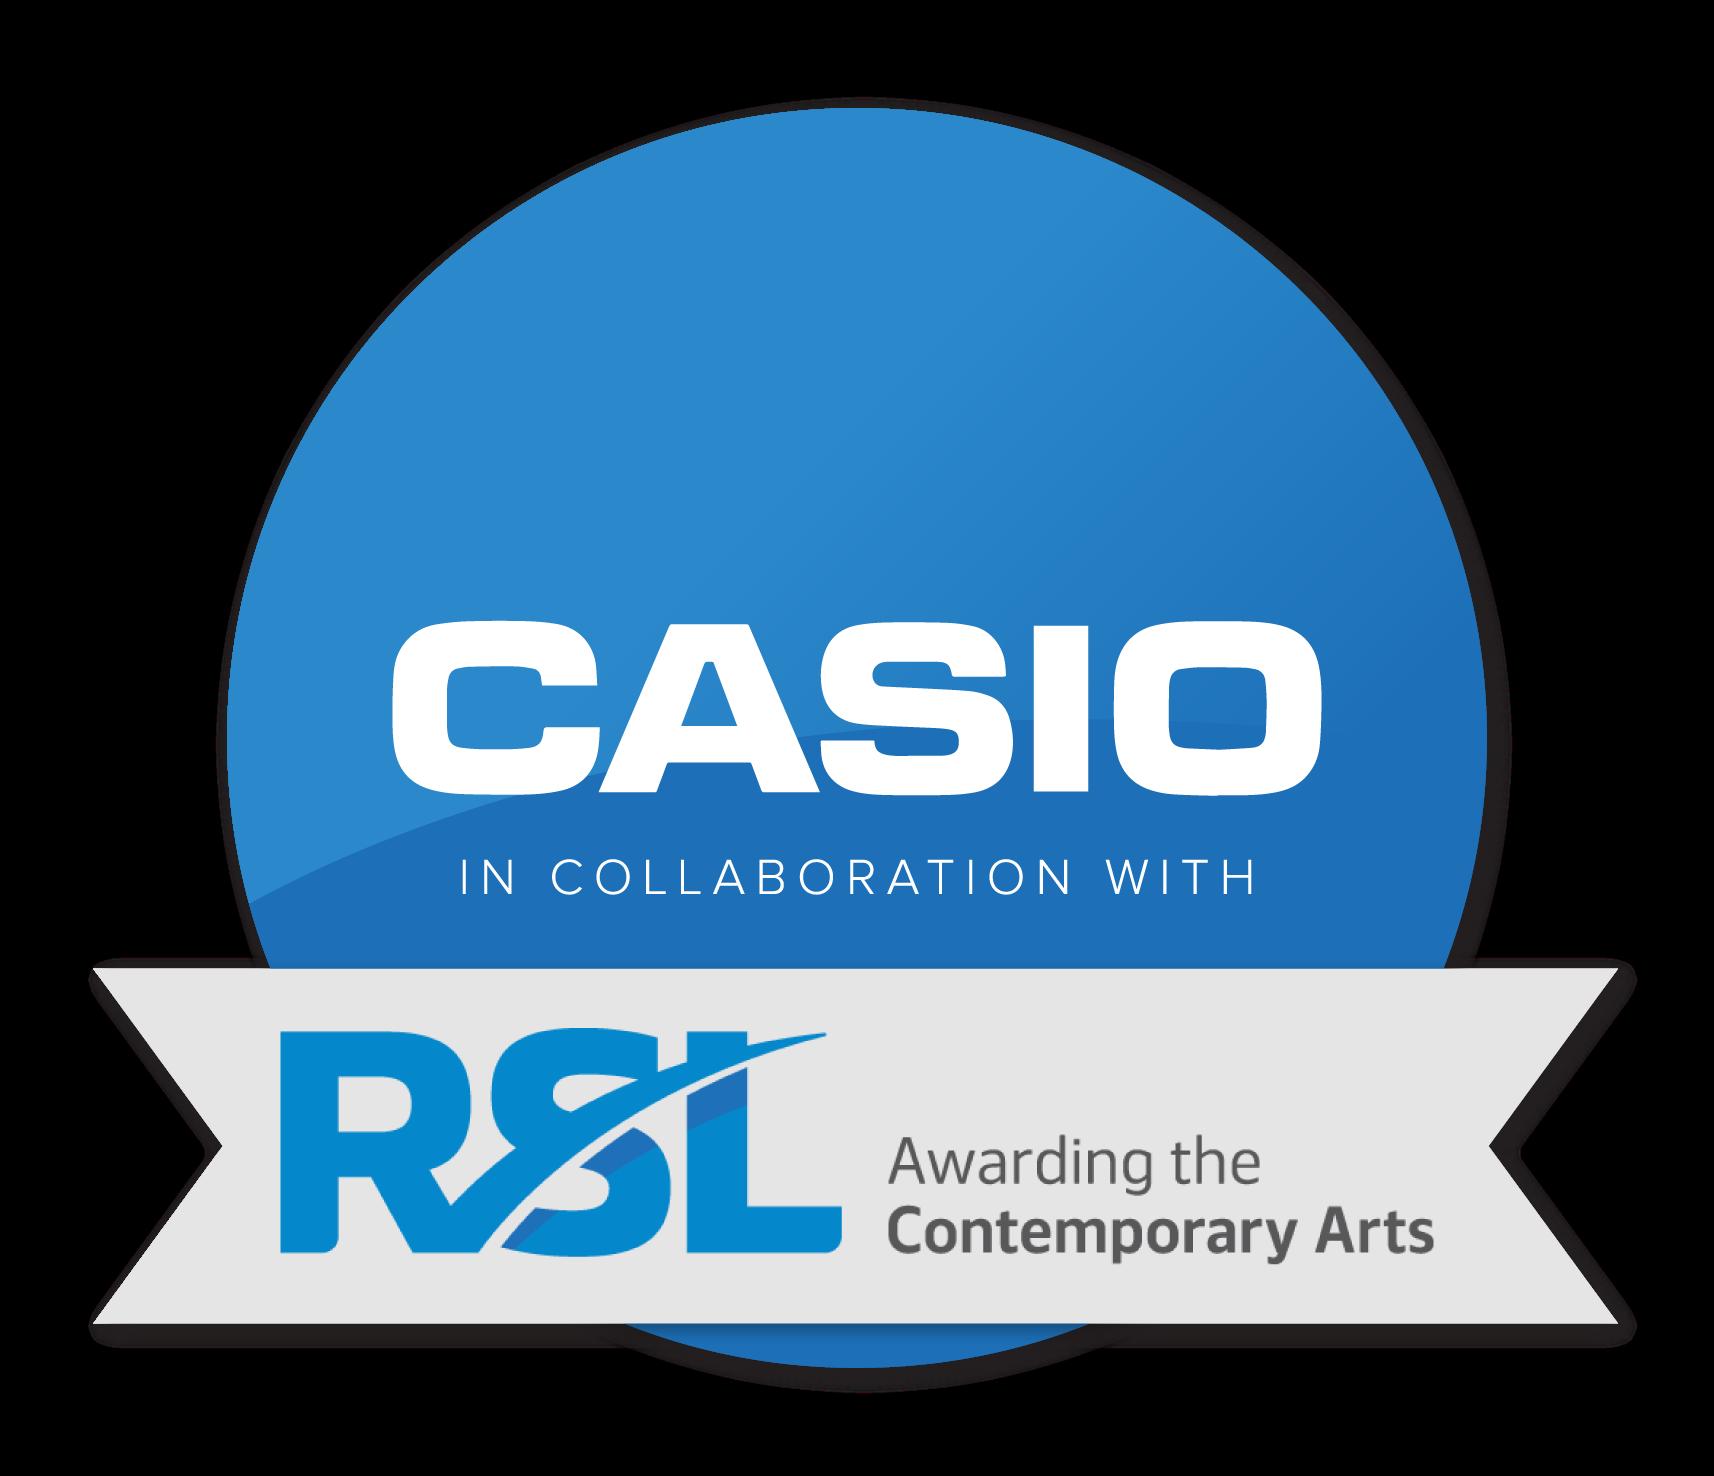 Casio_2017_28.07.17.jpg